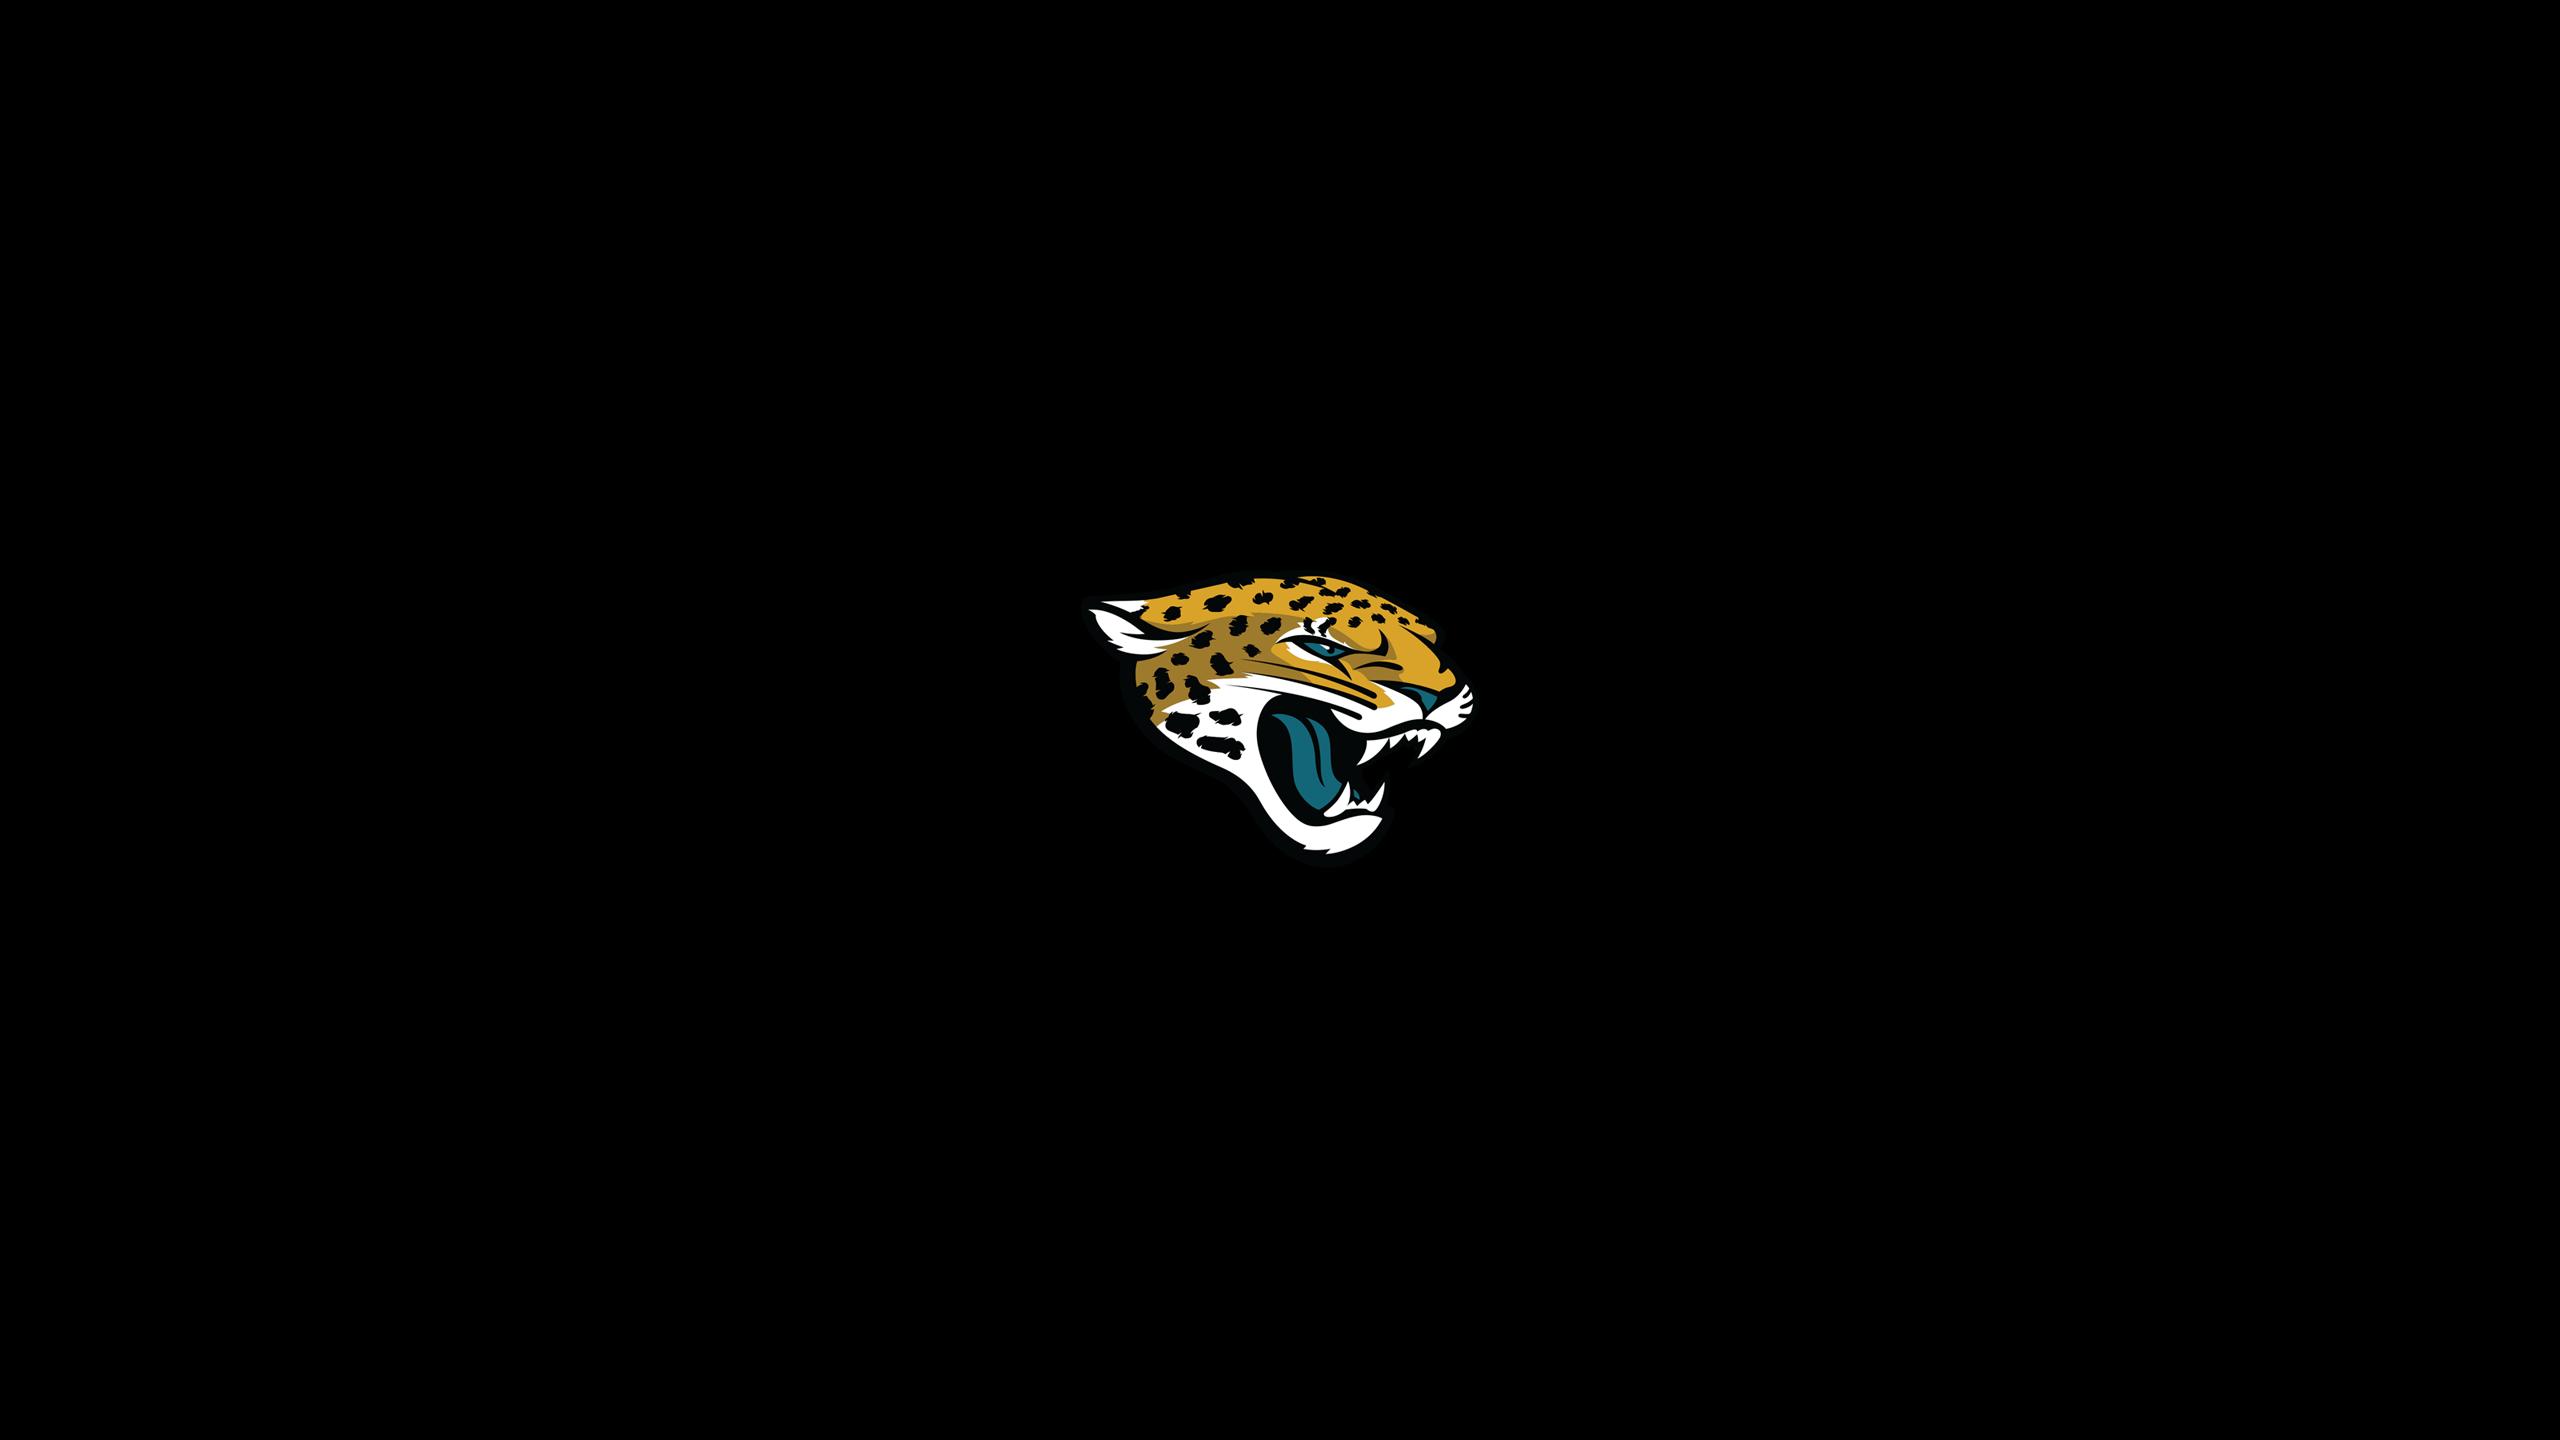 Amazing Jacksonville Jaguars Wallpaper Ololoshenka Pinterest